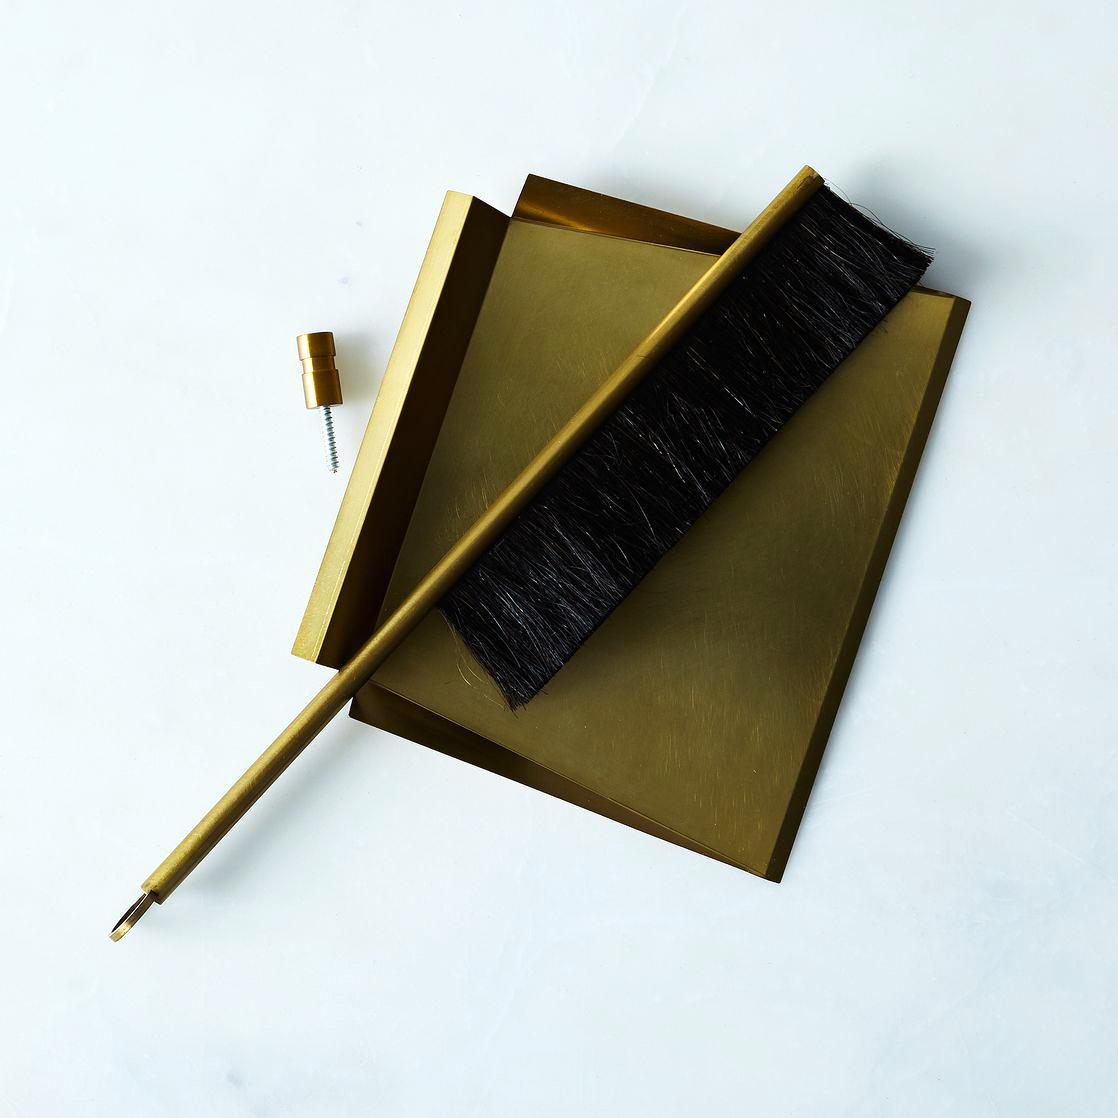 gold dust pan